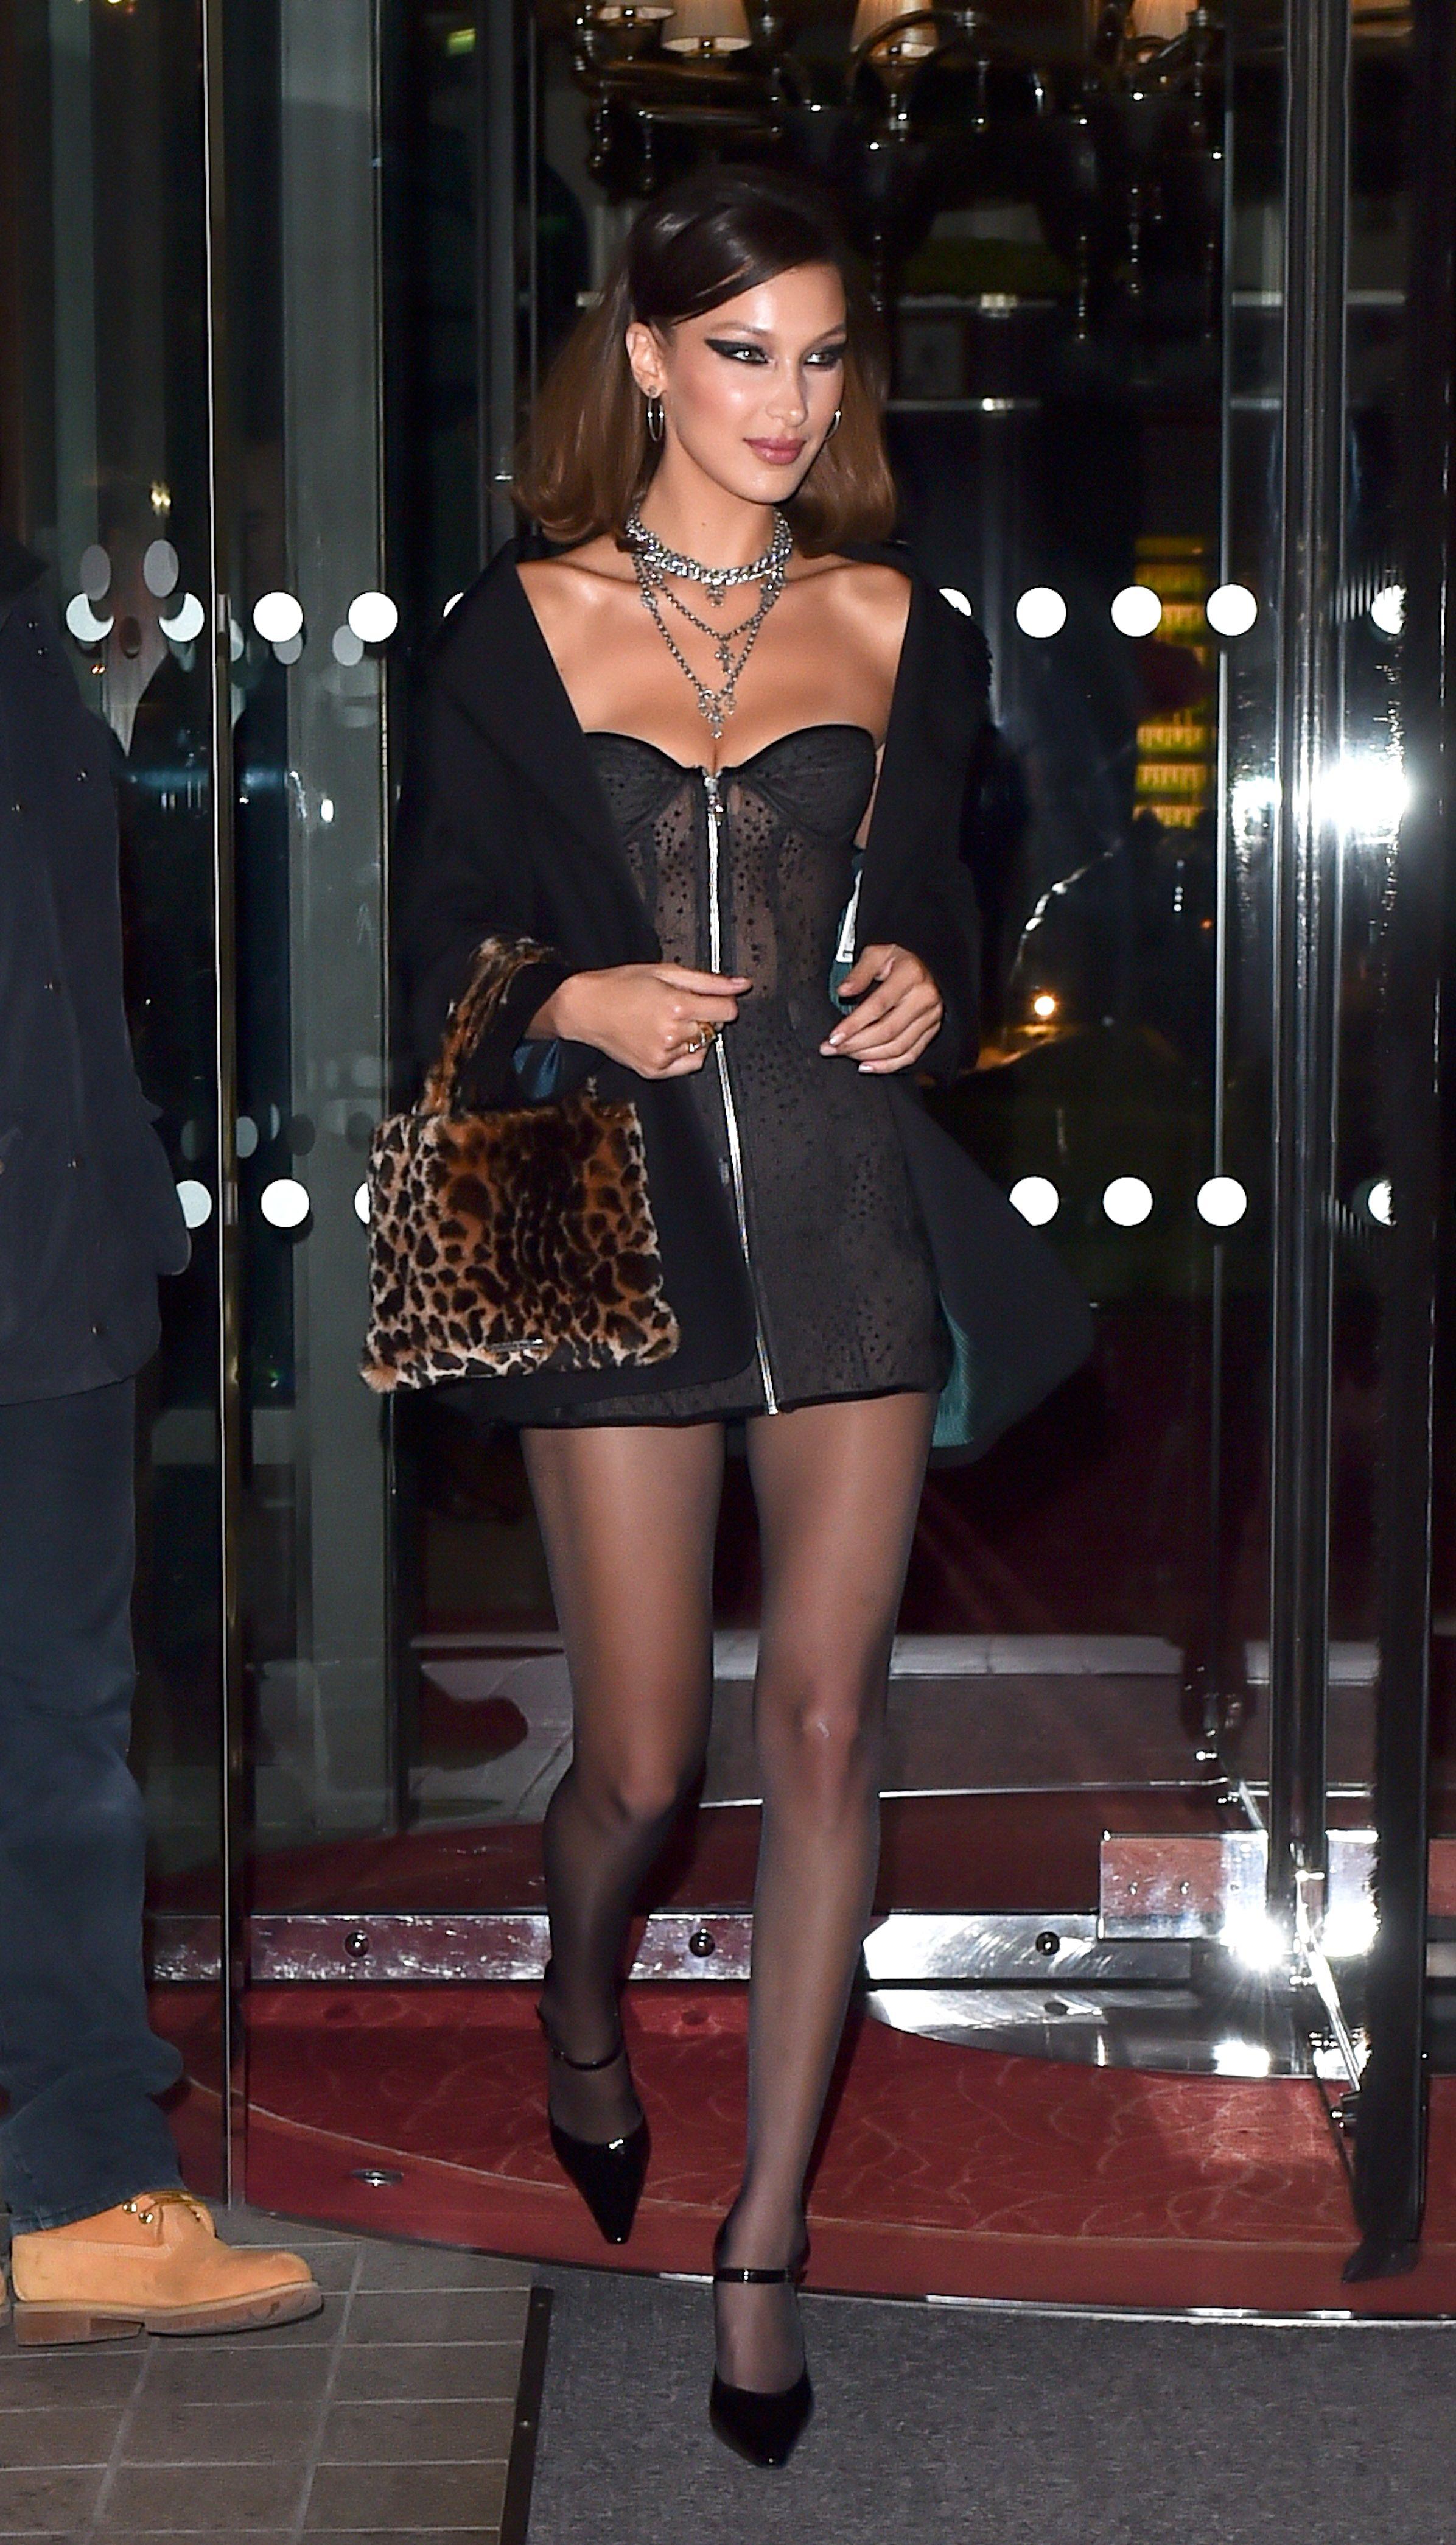 1d9a13dfc000 Bella Hadid Street Style - Bella Hadid s Hottest Looks